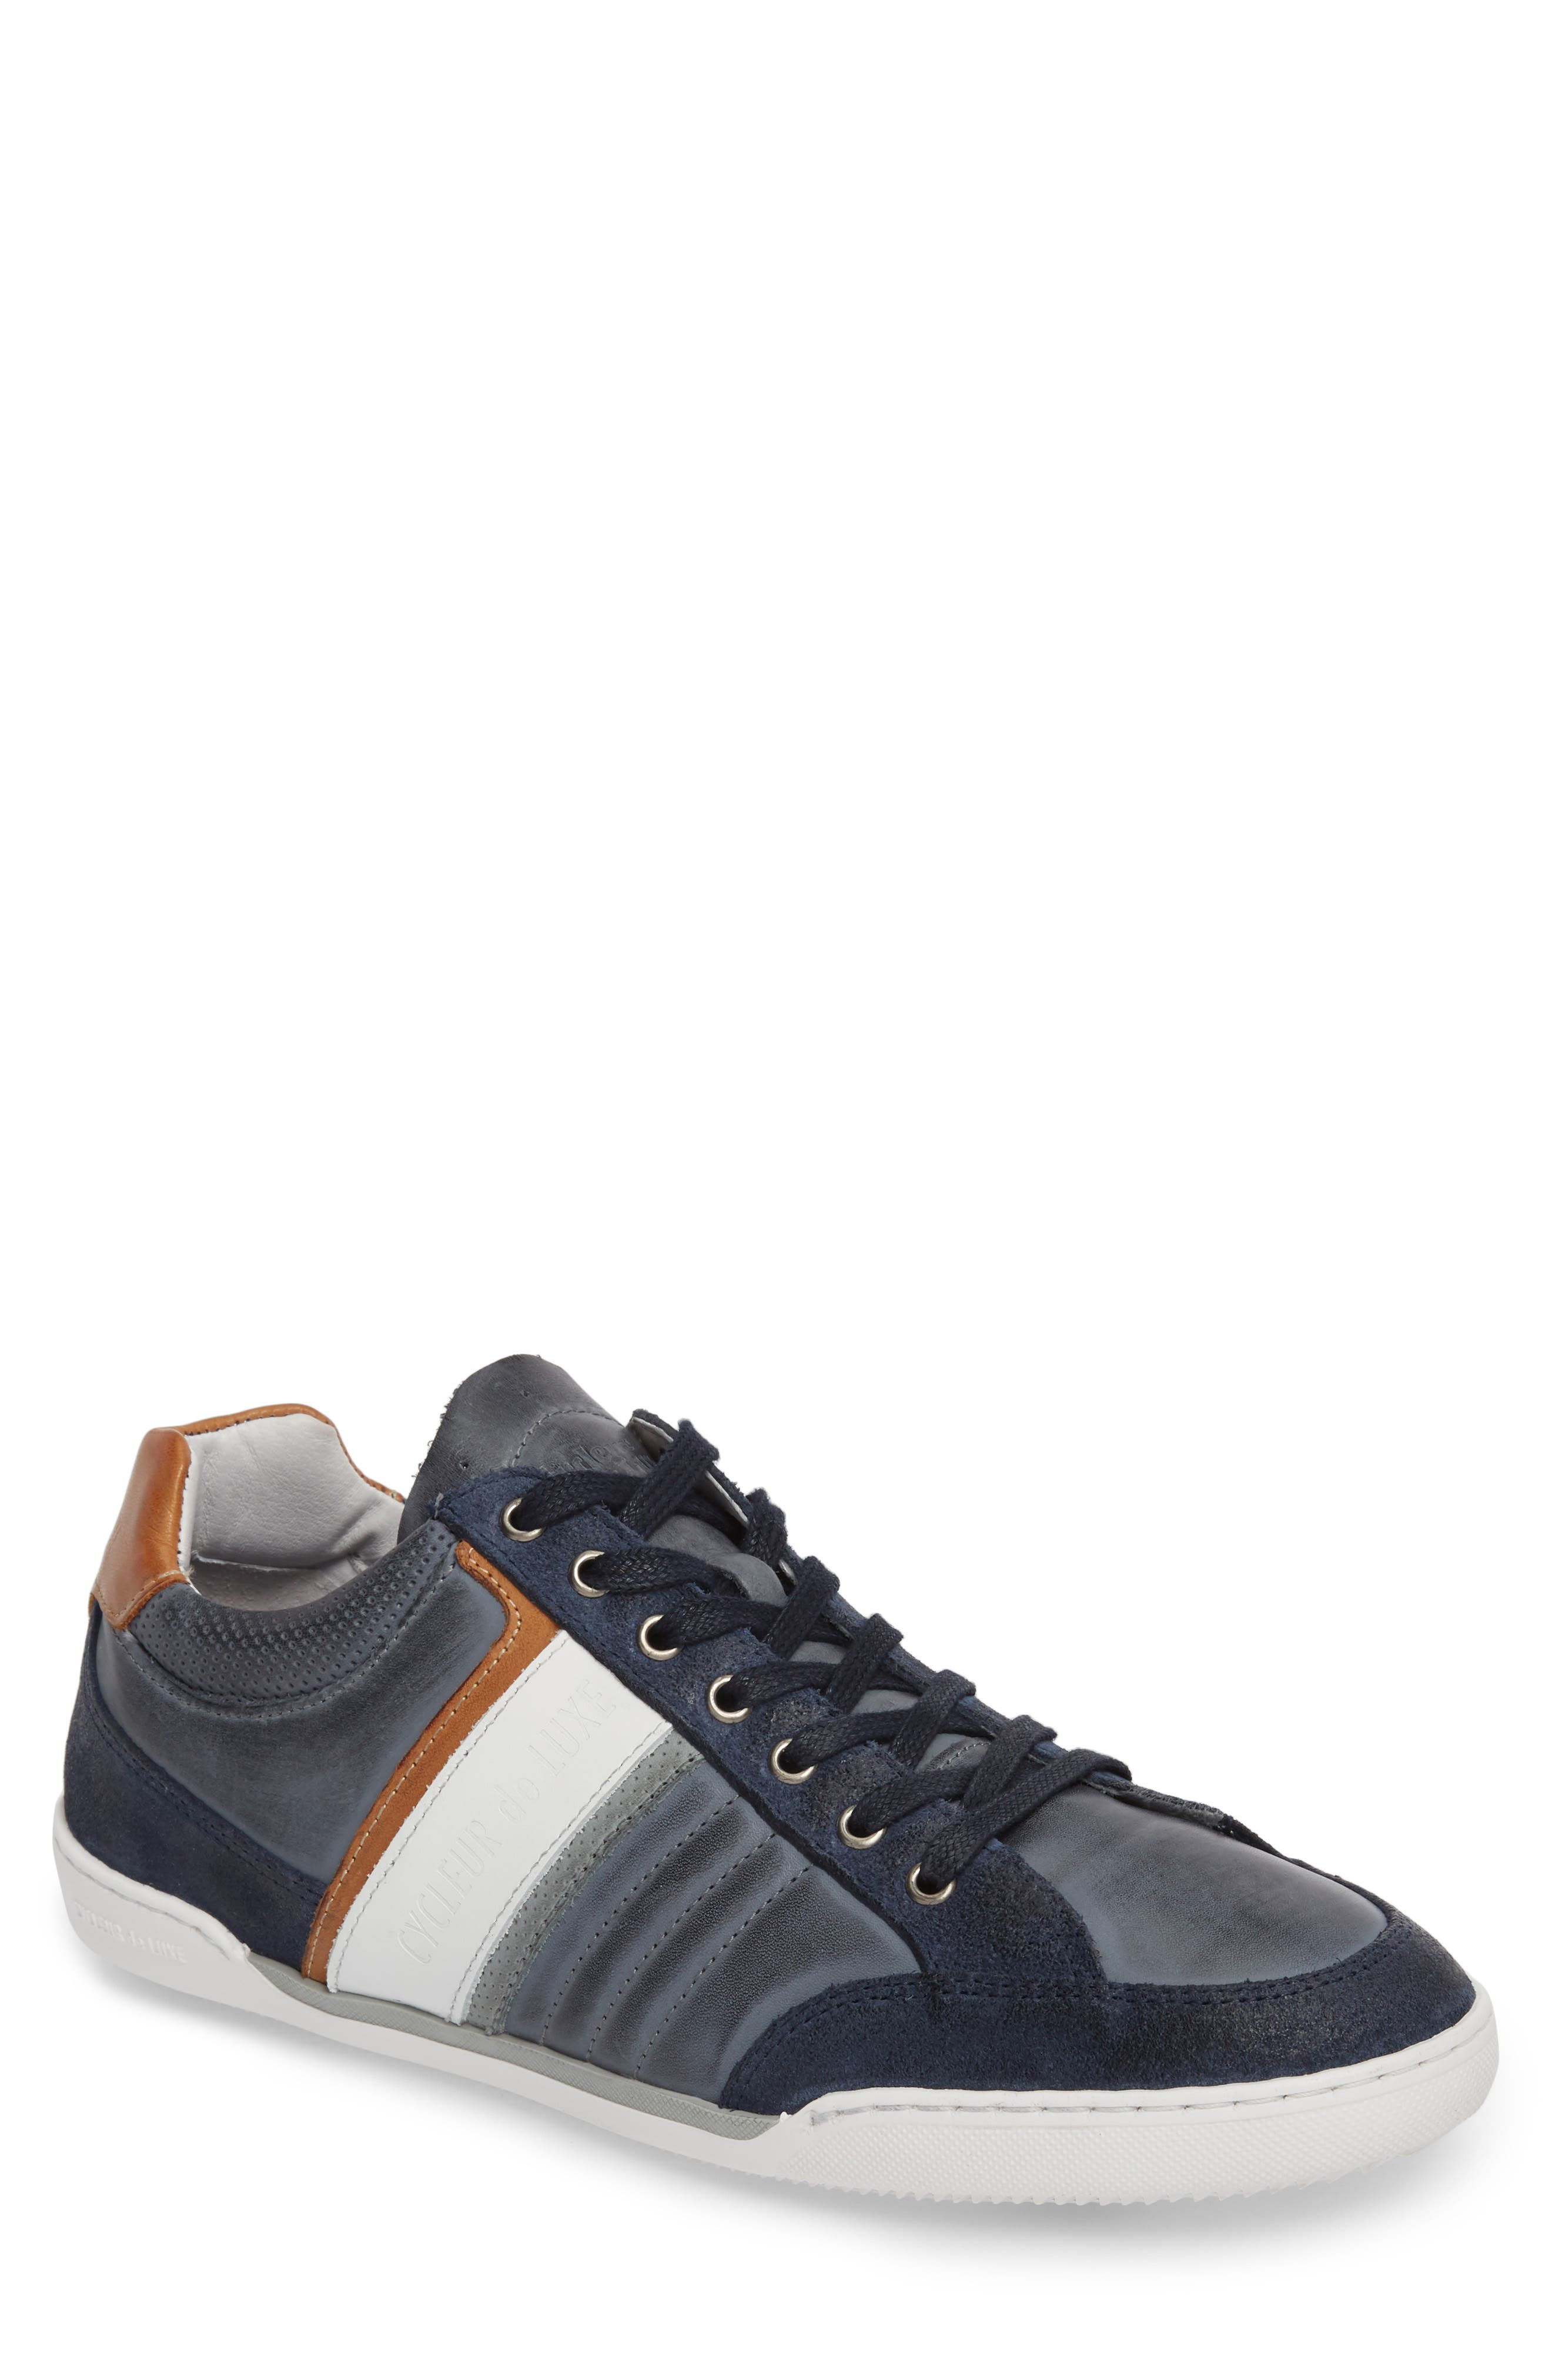 Solo Low Top Sneaker,                         Main,                         color, Denim/ White/ Cognac Leather